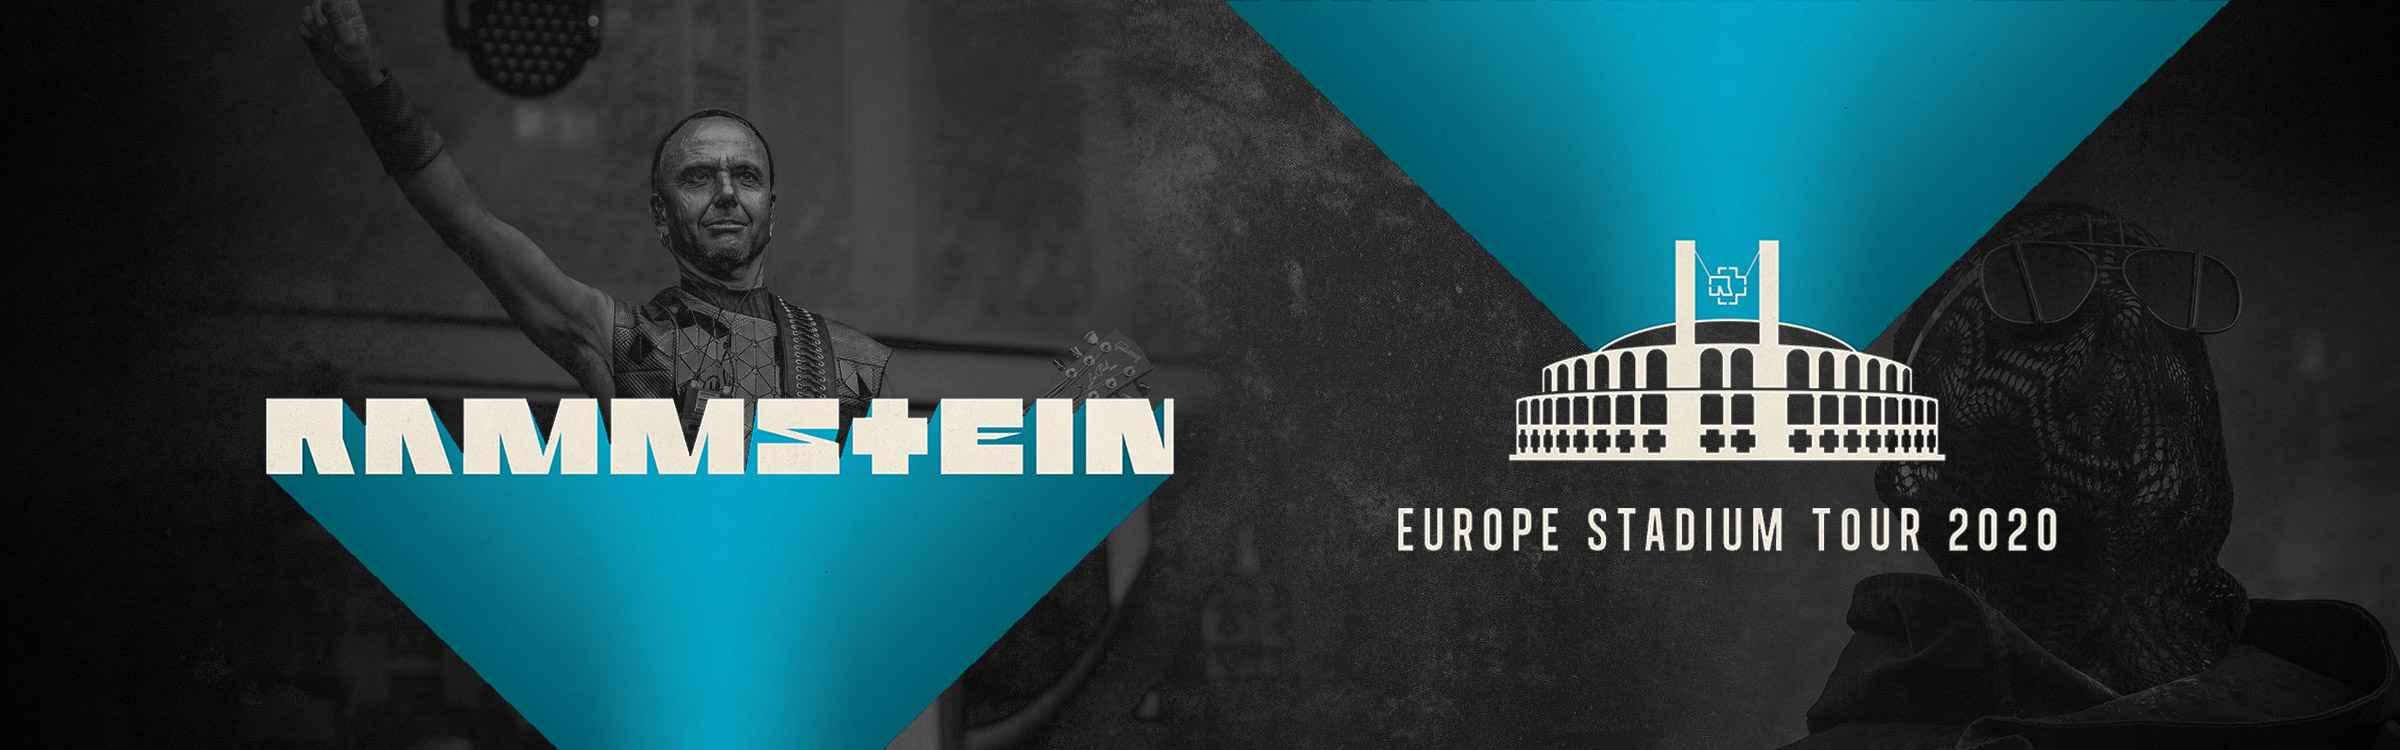 Rammstein World - Europe Stadium tour 2020